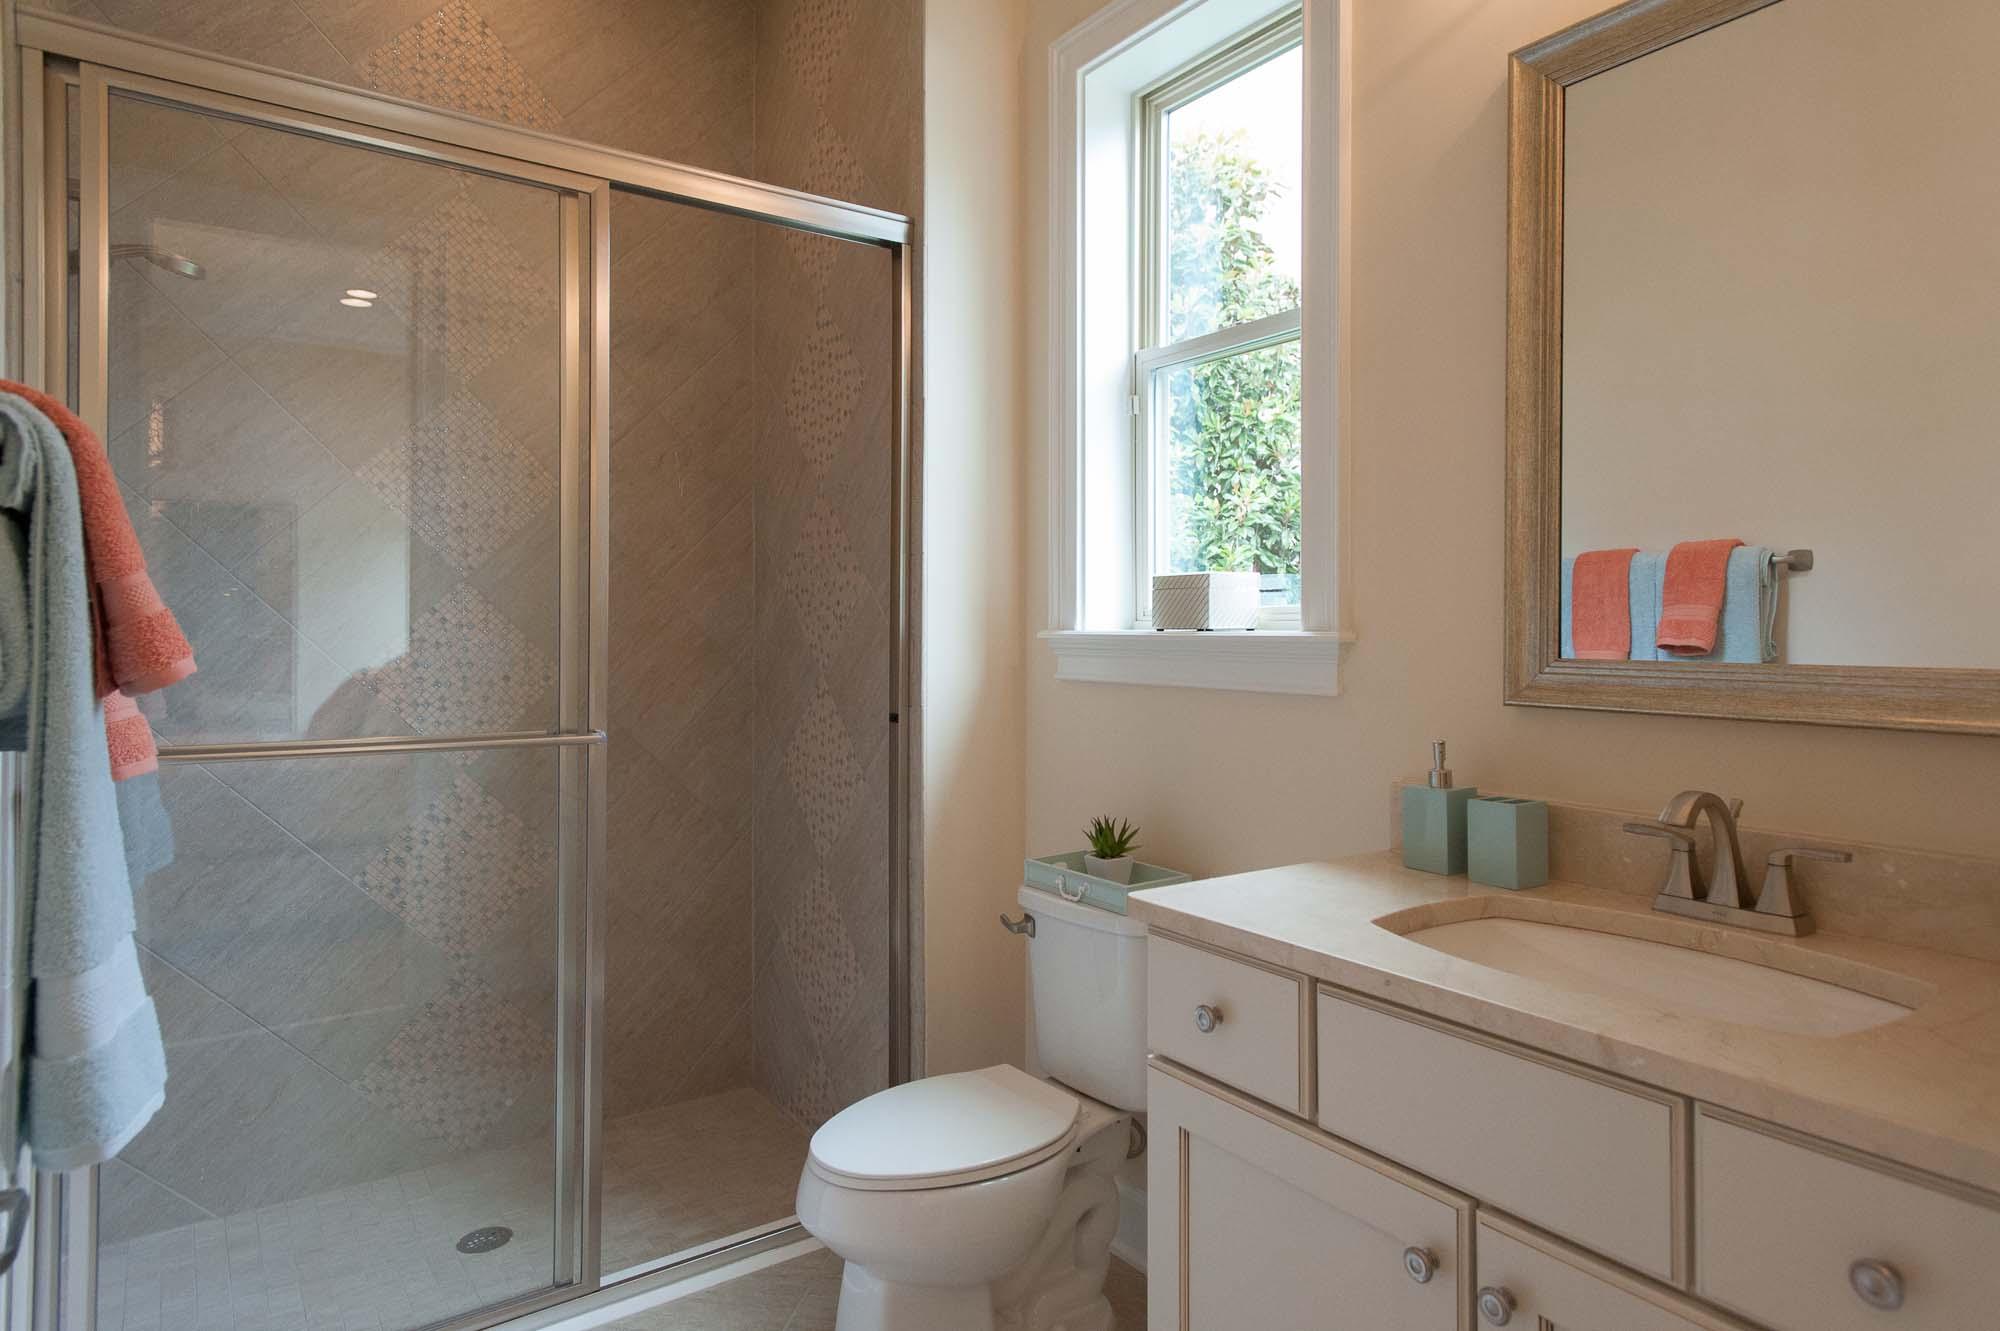 sterling-lennar-celestina-st johns-florida-nefba-northeast florida-southeastern united states-residential interior design--contemporary-bathroom-shower-tile.jpg